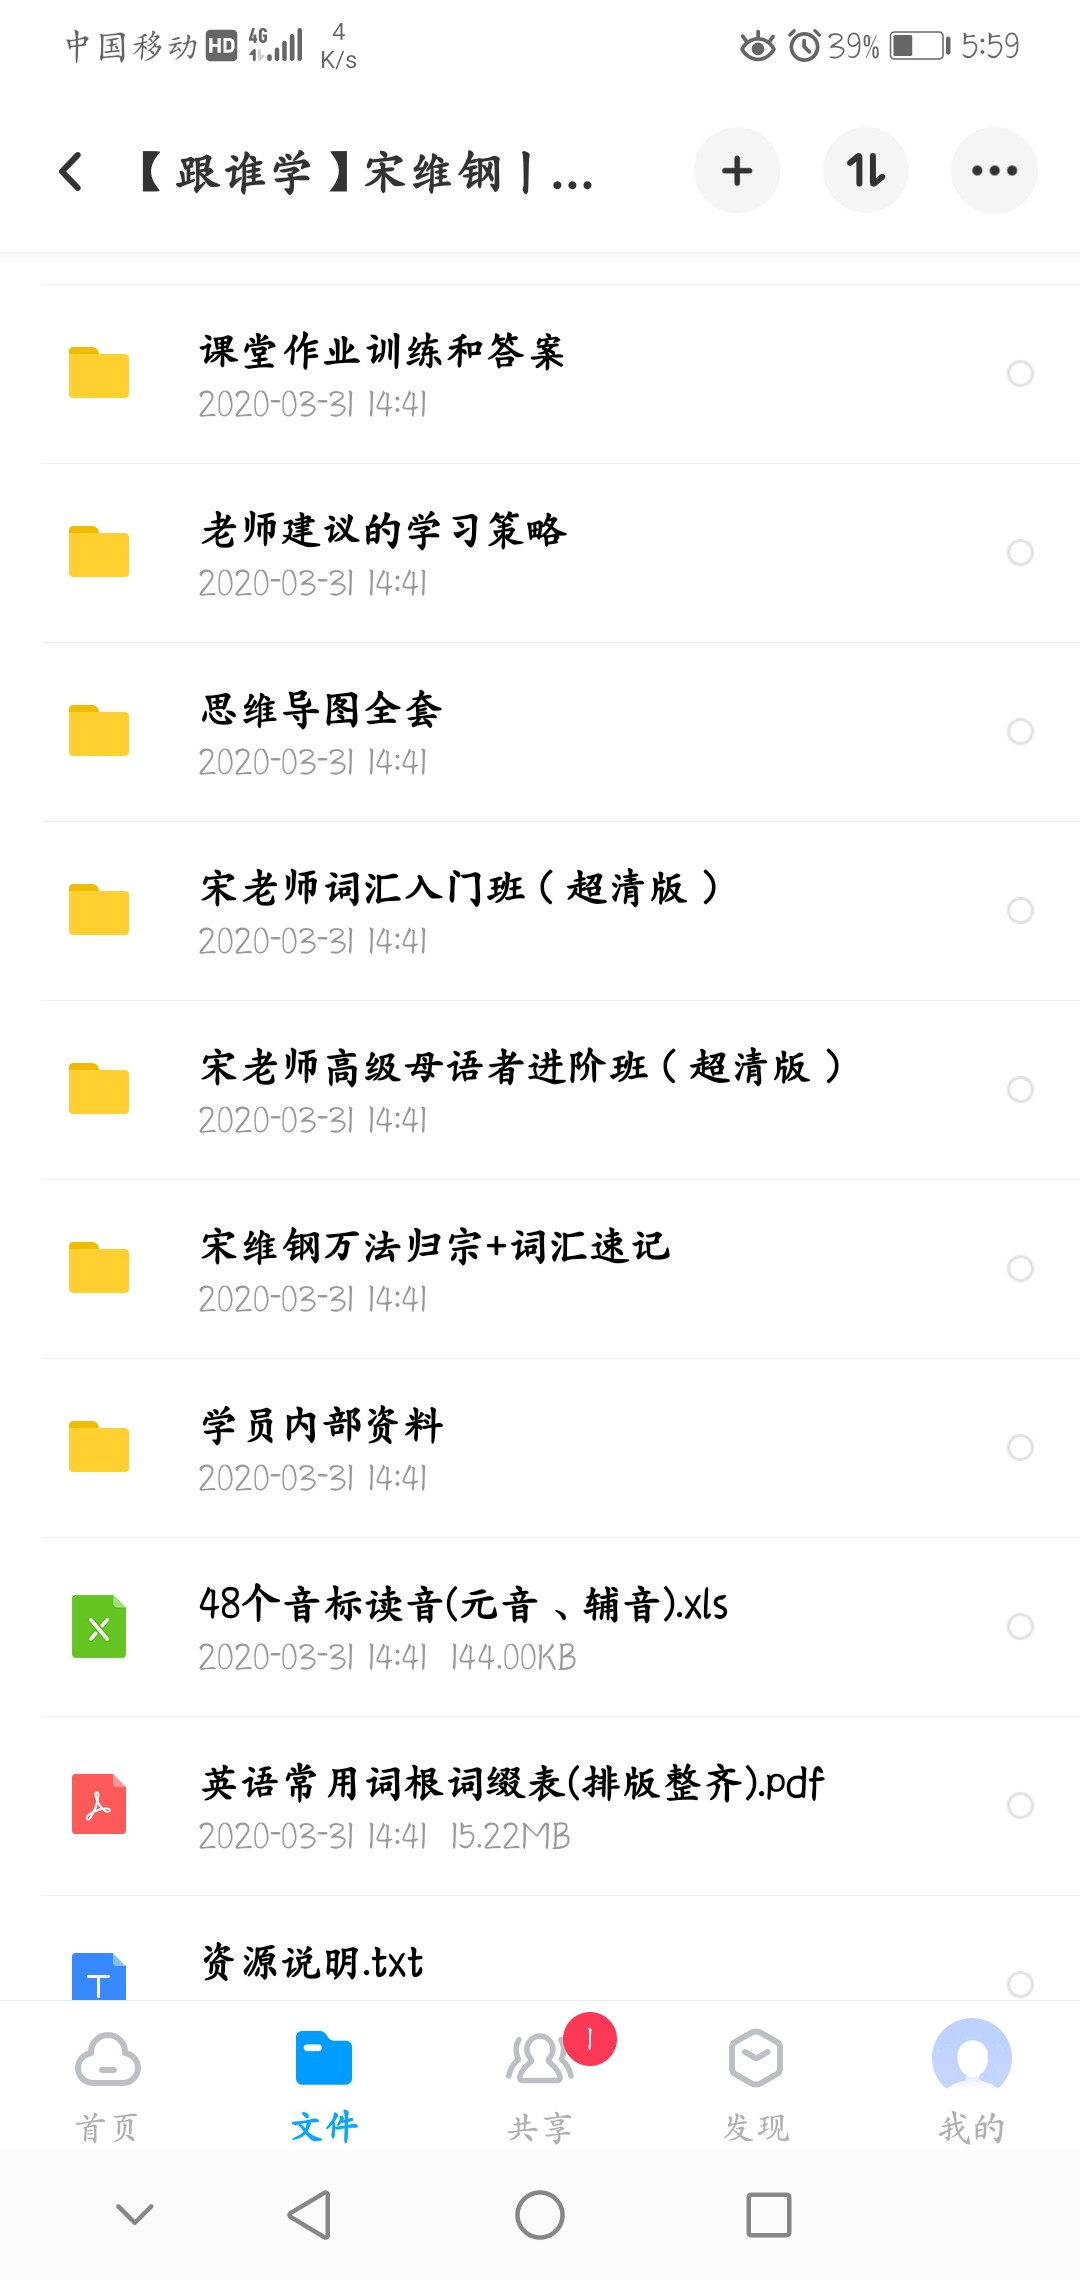 Screenshot_20200722_175931_com.baidu.netdisk